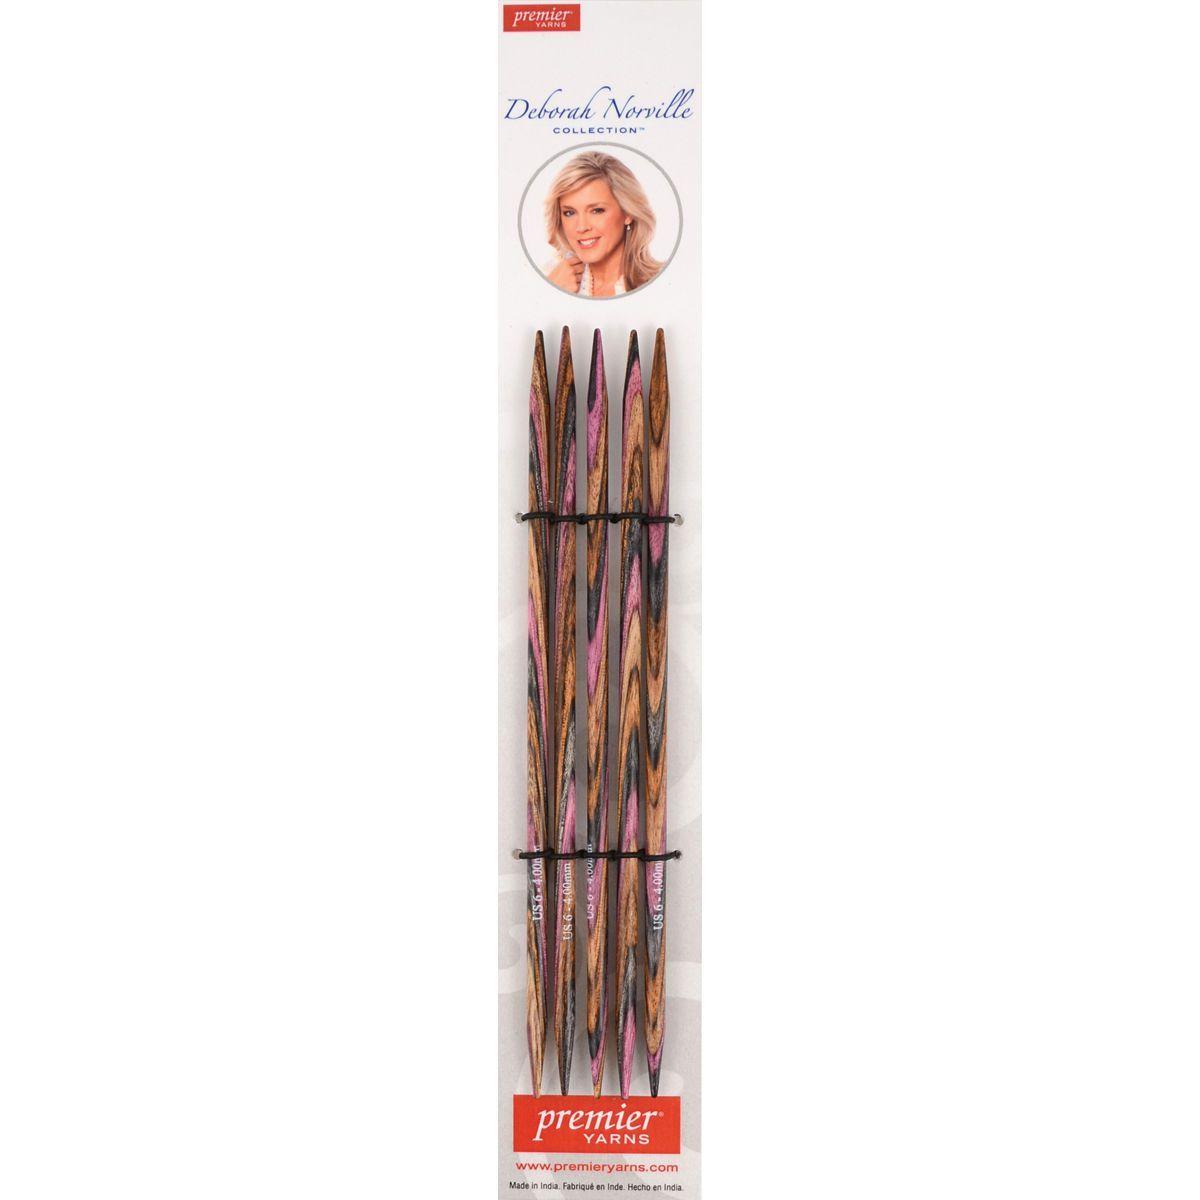 "Deborah Norville Double Pointed Needles 6""-Size 10.5/6.5mm"